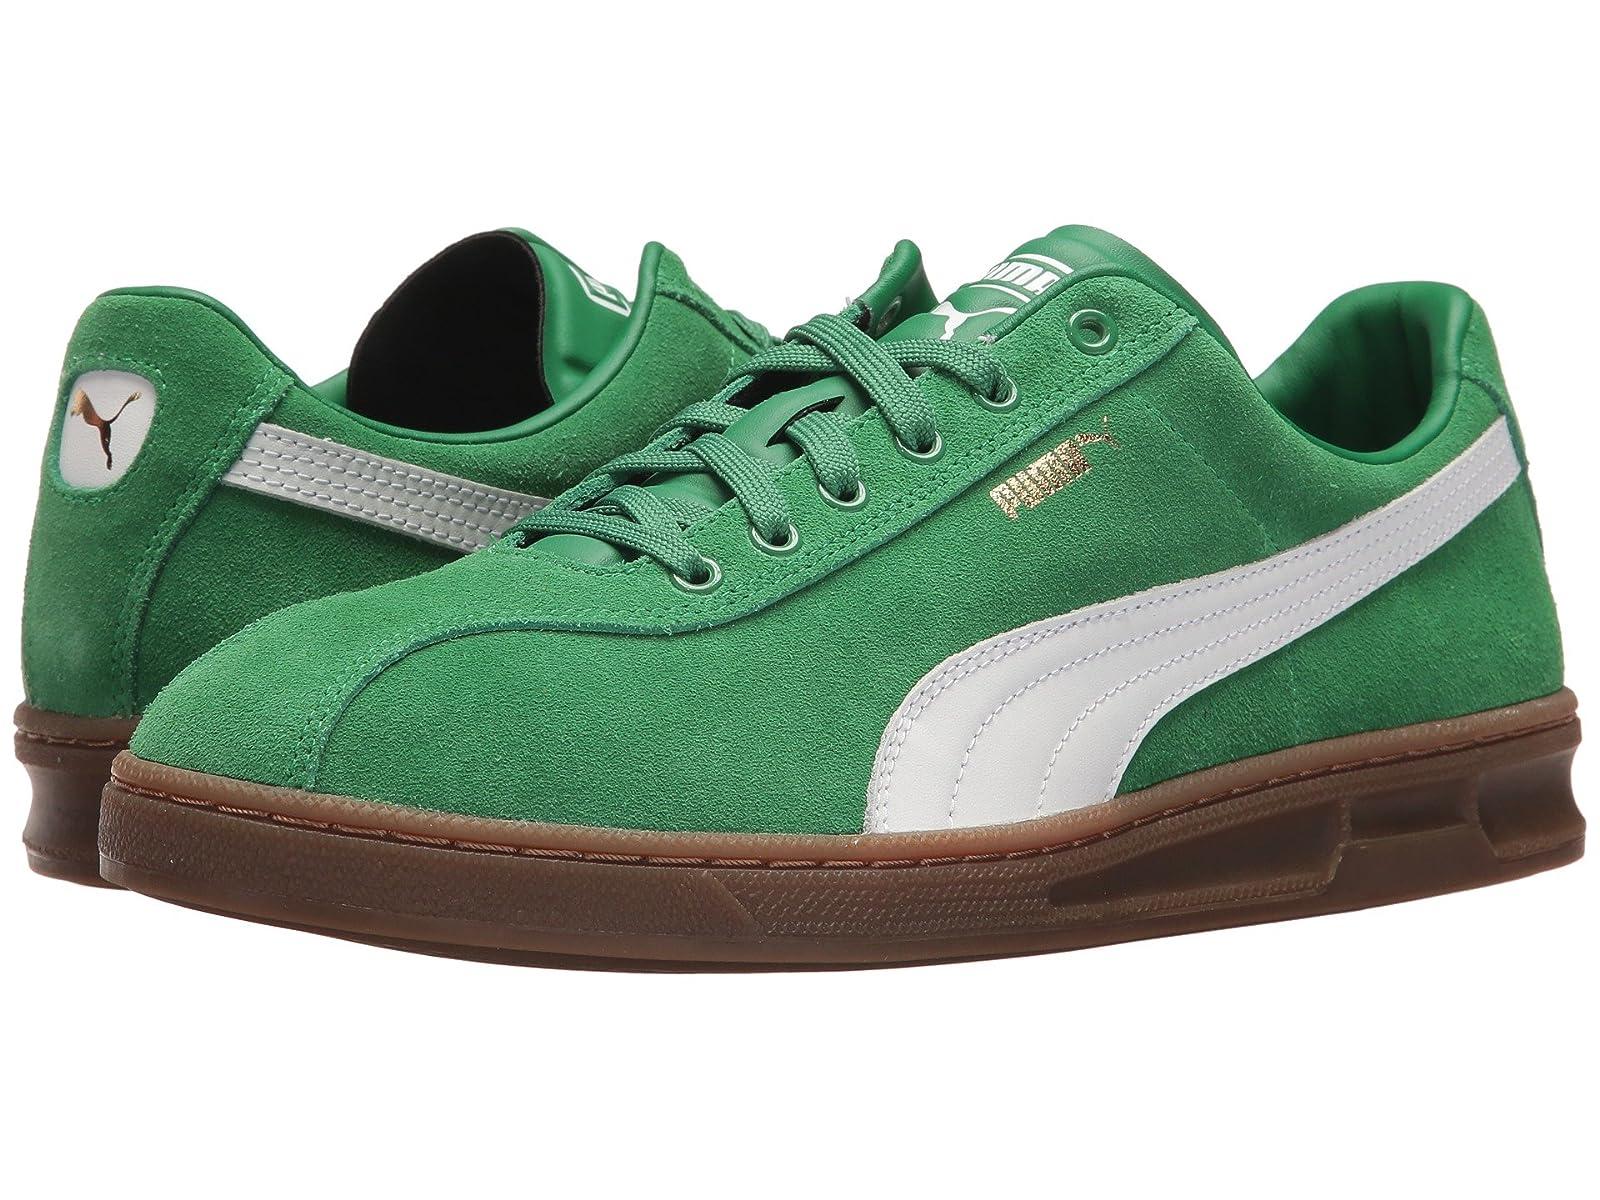 PUMA Puma Tk Indoor HeritageCheap and distinctive eye-catching shoes